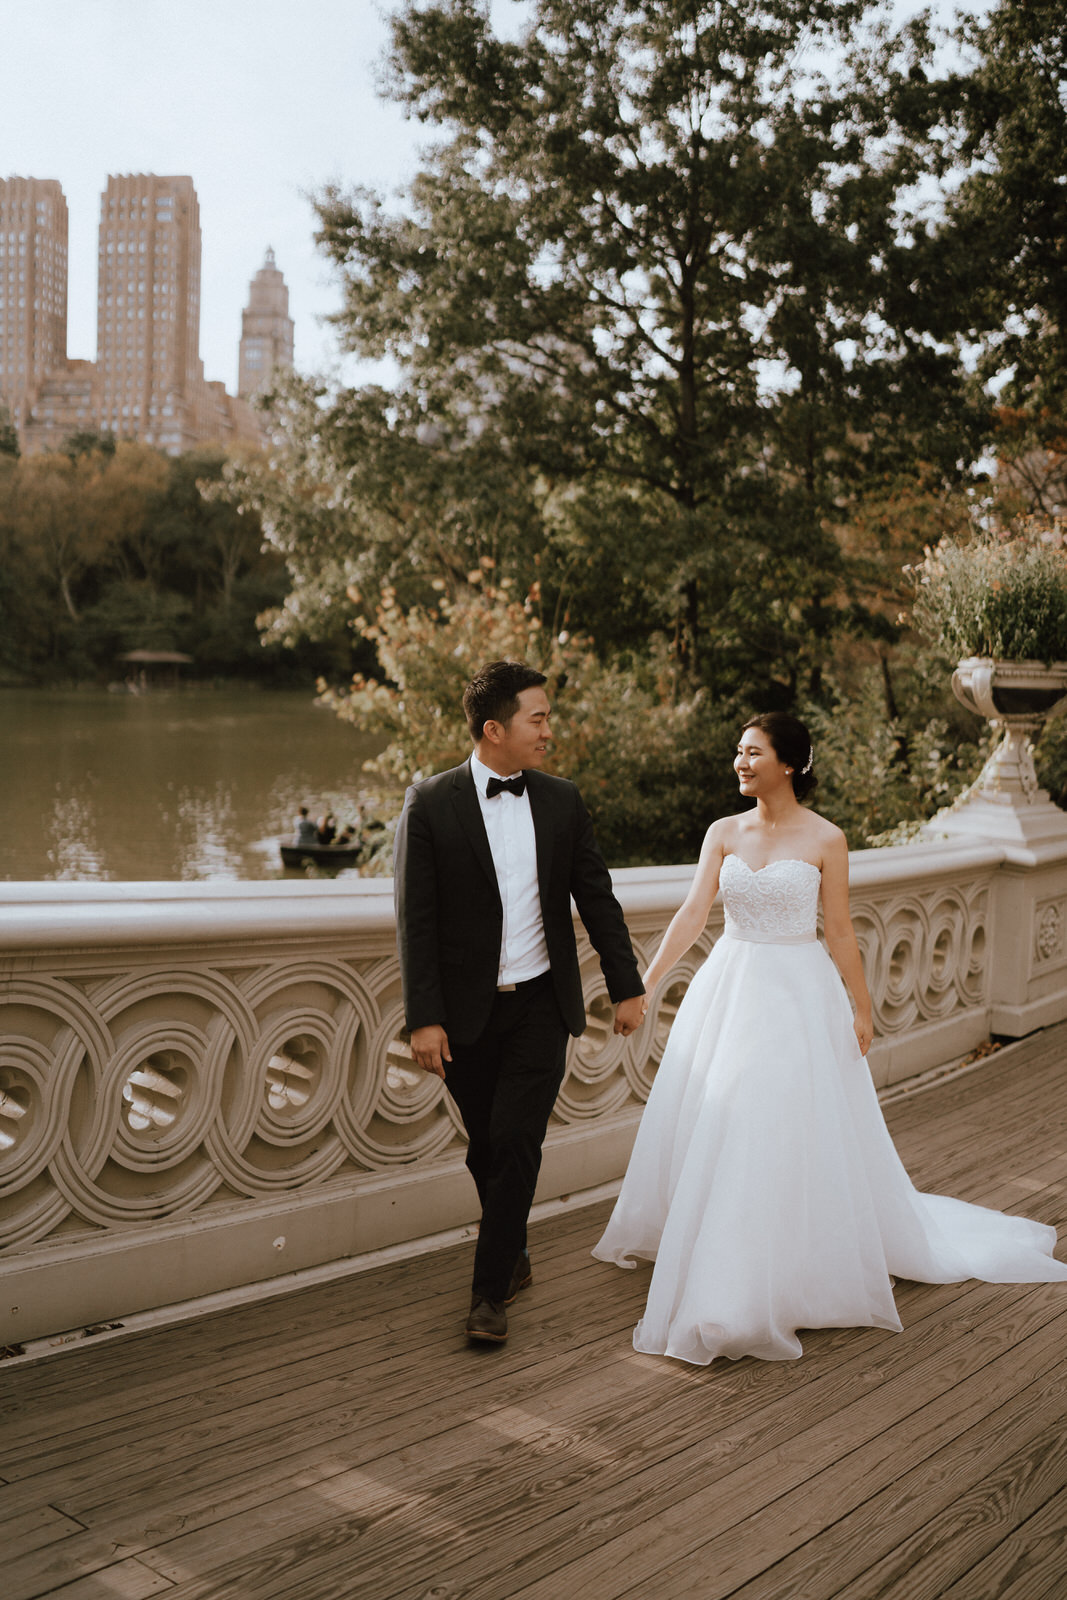 Central Park Elopement Photos-Bow Bridge-Michelle Gonzalez Photography- New York Wedding Photographer-48.jpg